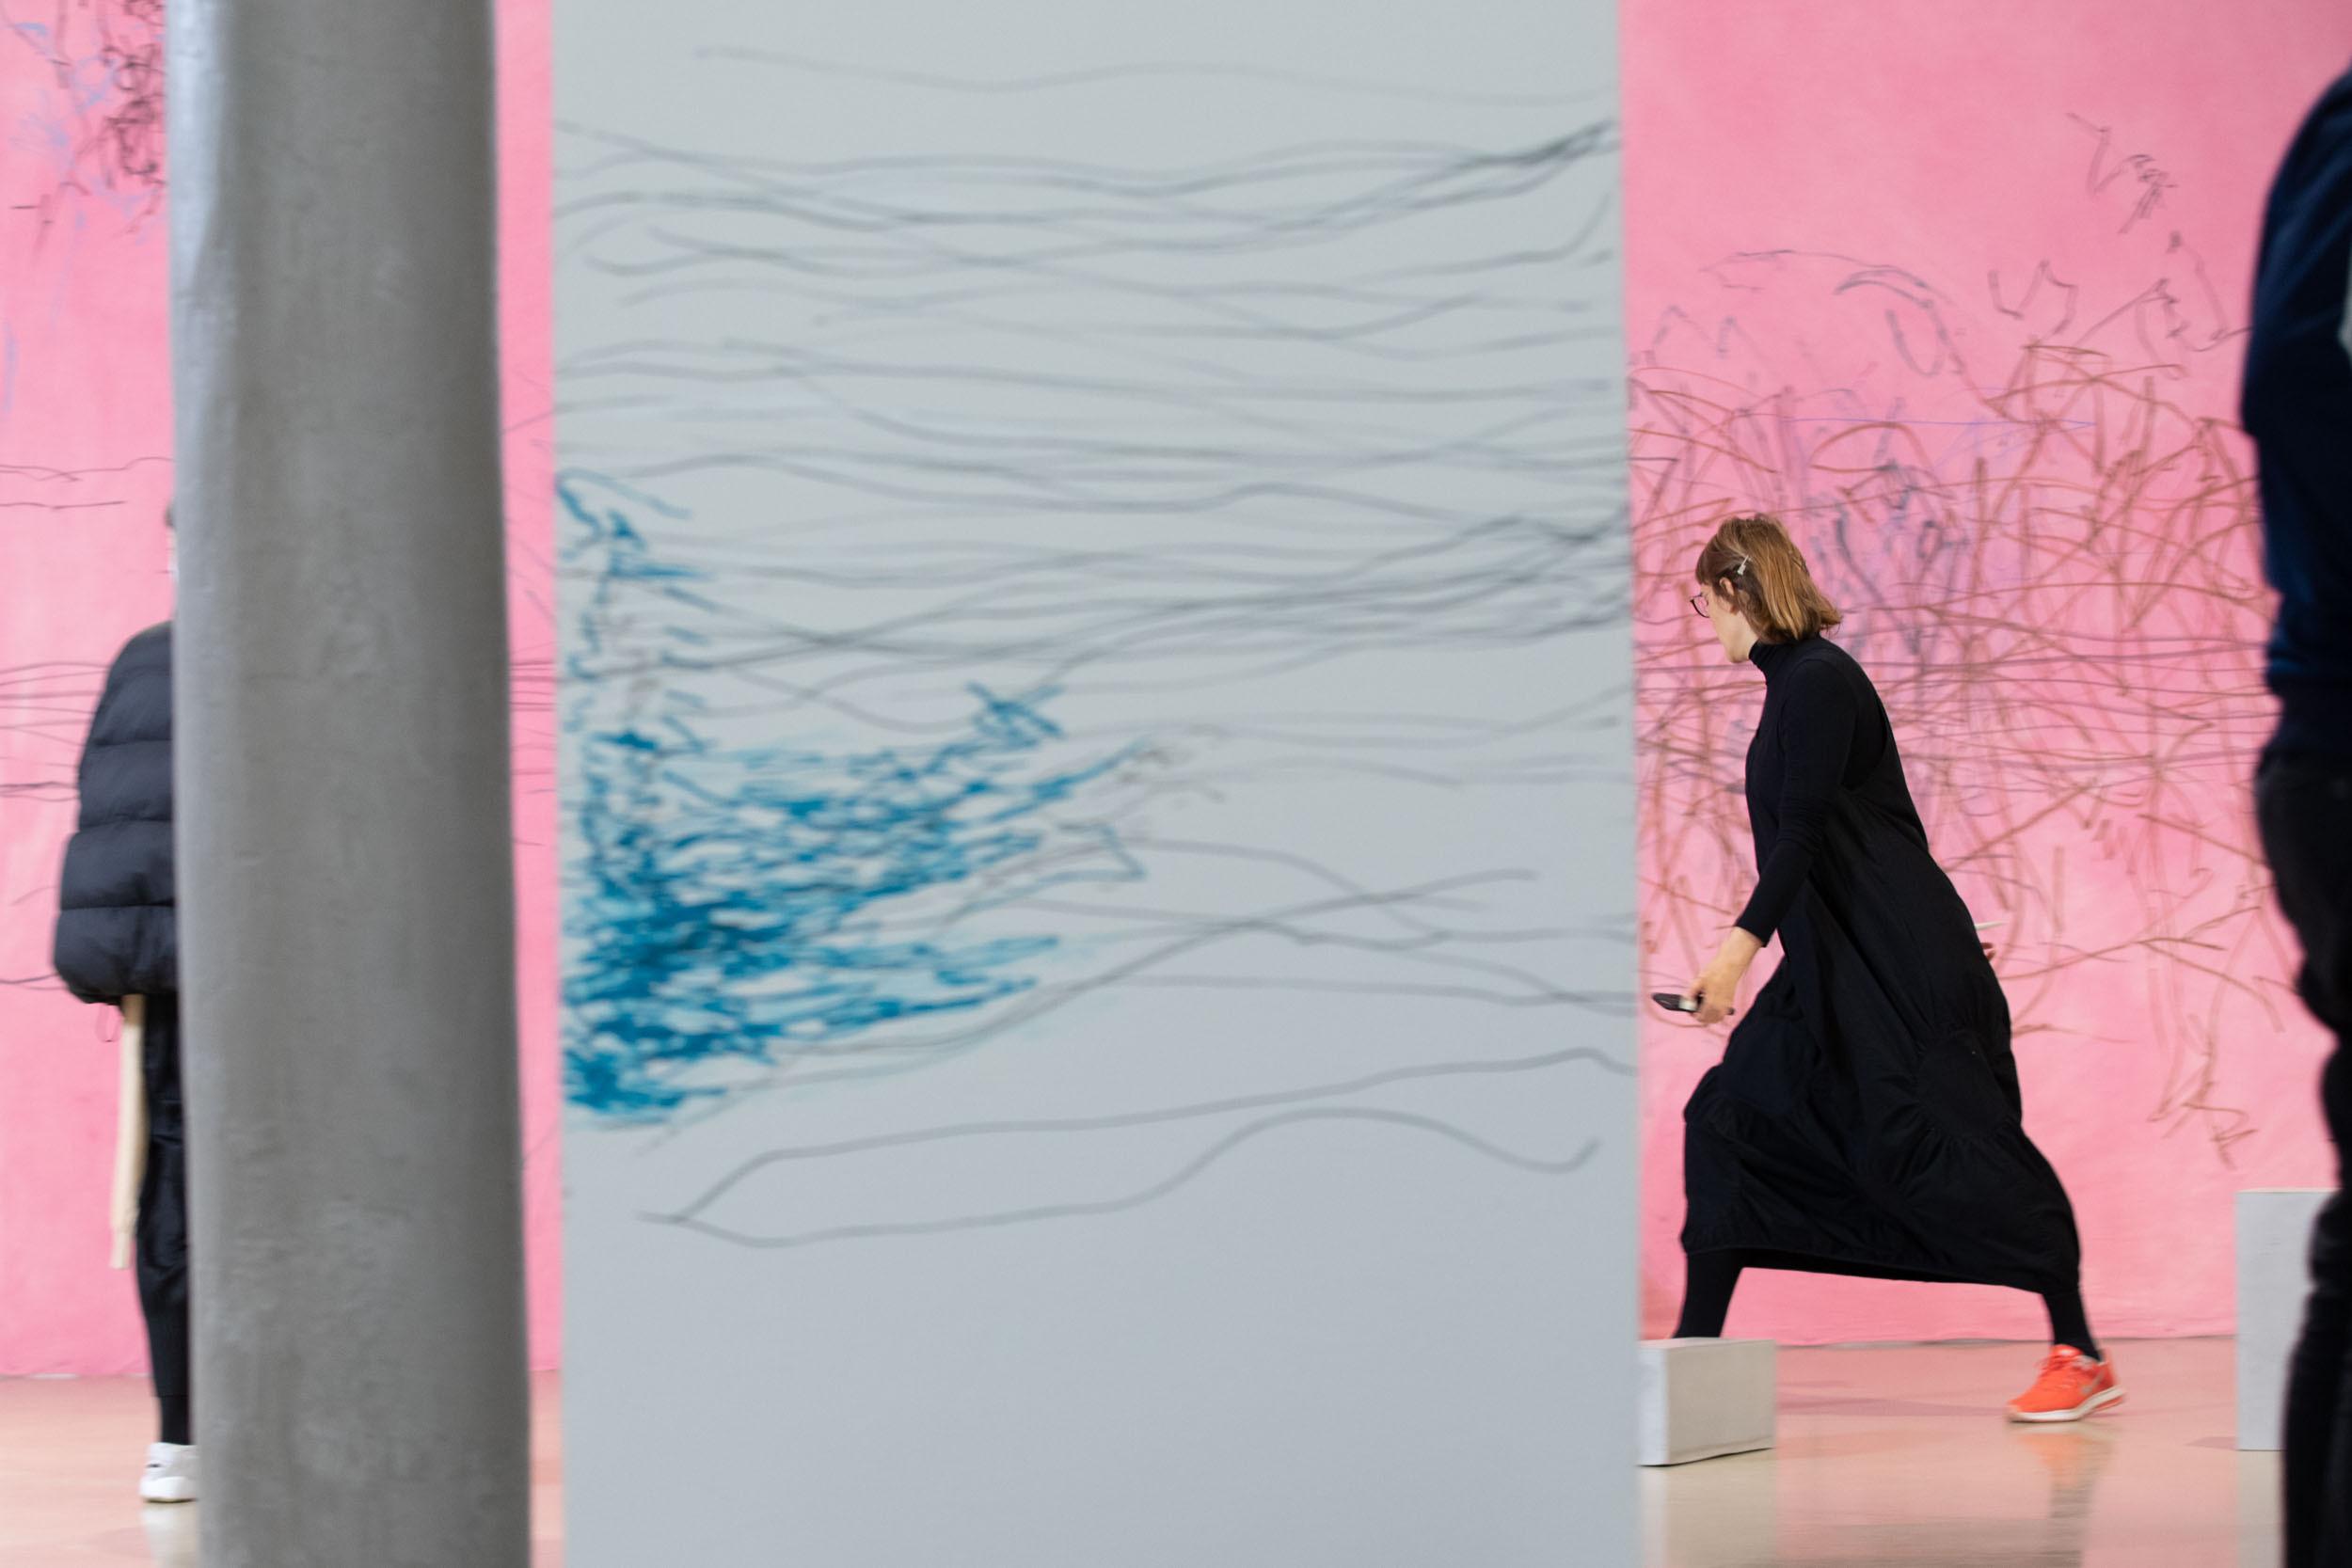 eSeL Foto: Sweet Sixteen: Fanni Futterknecht – Power to the Unspoken_Echoes of Resistance (16.4.2021, Video-Rehearsal @ Kunstraum Niederösterreich)